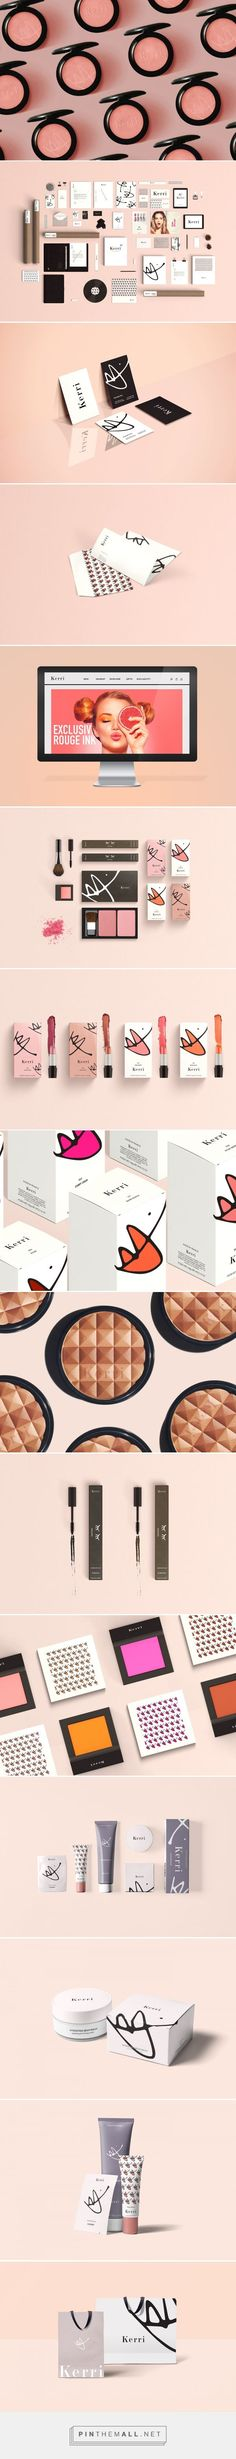 Kerri Cosmetics Branding and Packaging by Danielle Han   Fivestar Branding – Design and Branding Agency & Inspiration Gallery